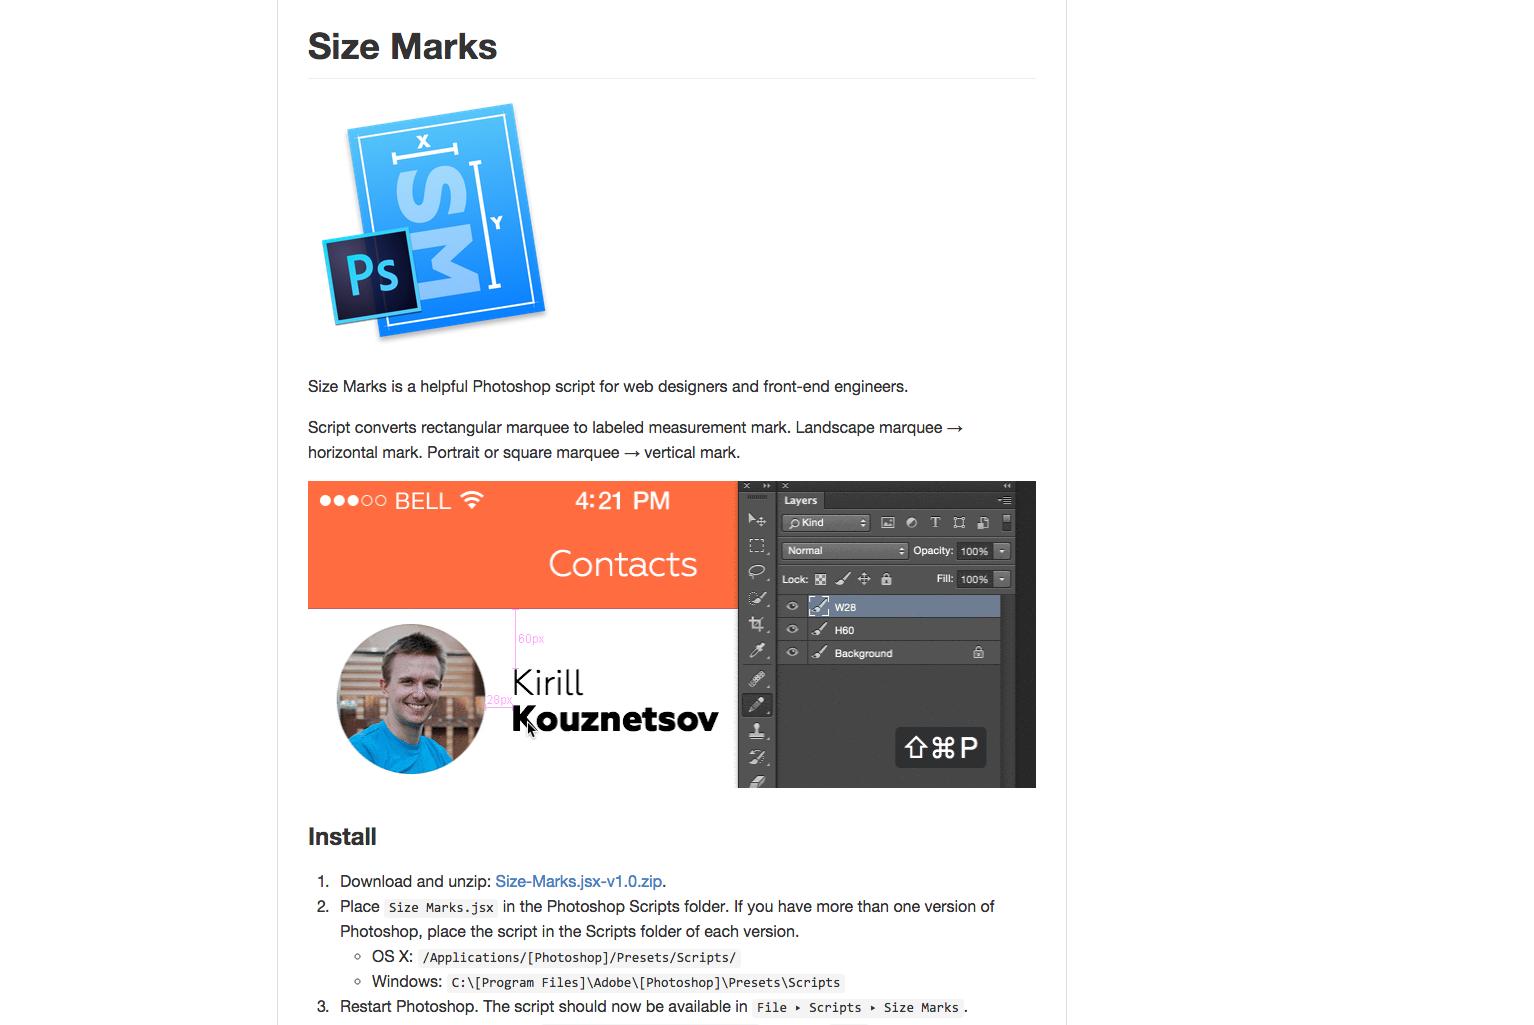 sizemarks | web-crunch.com